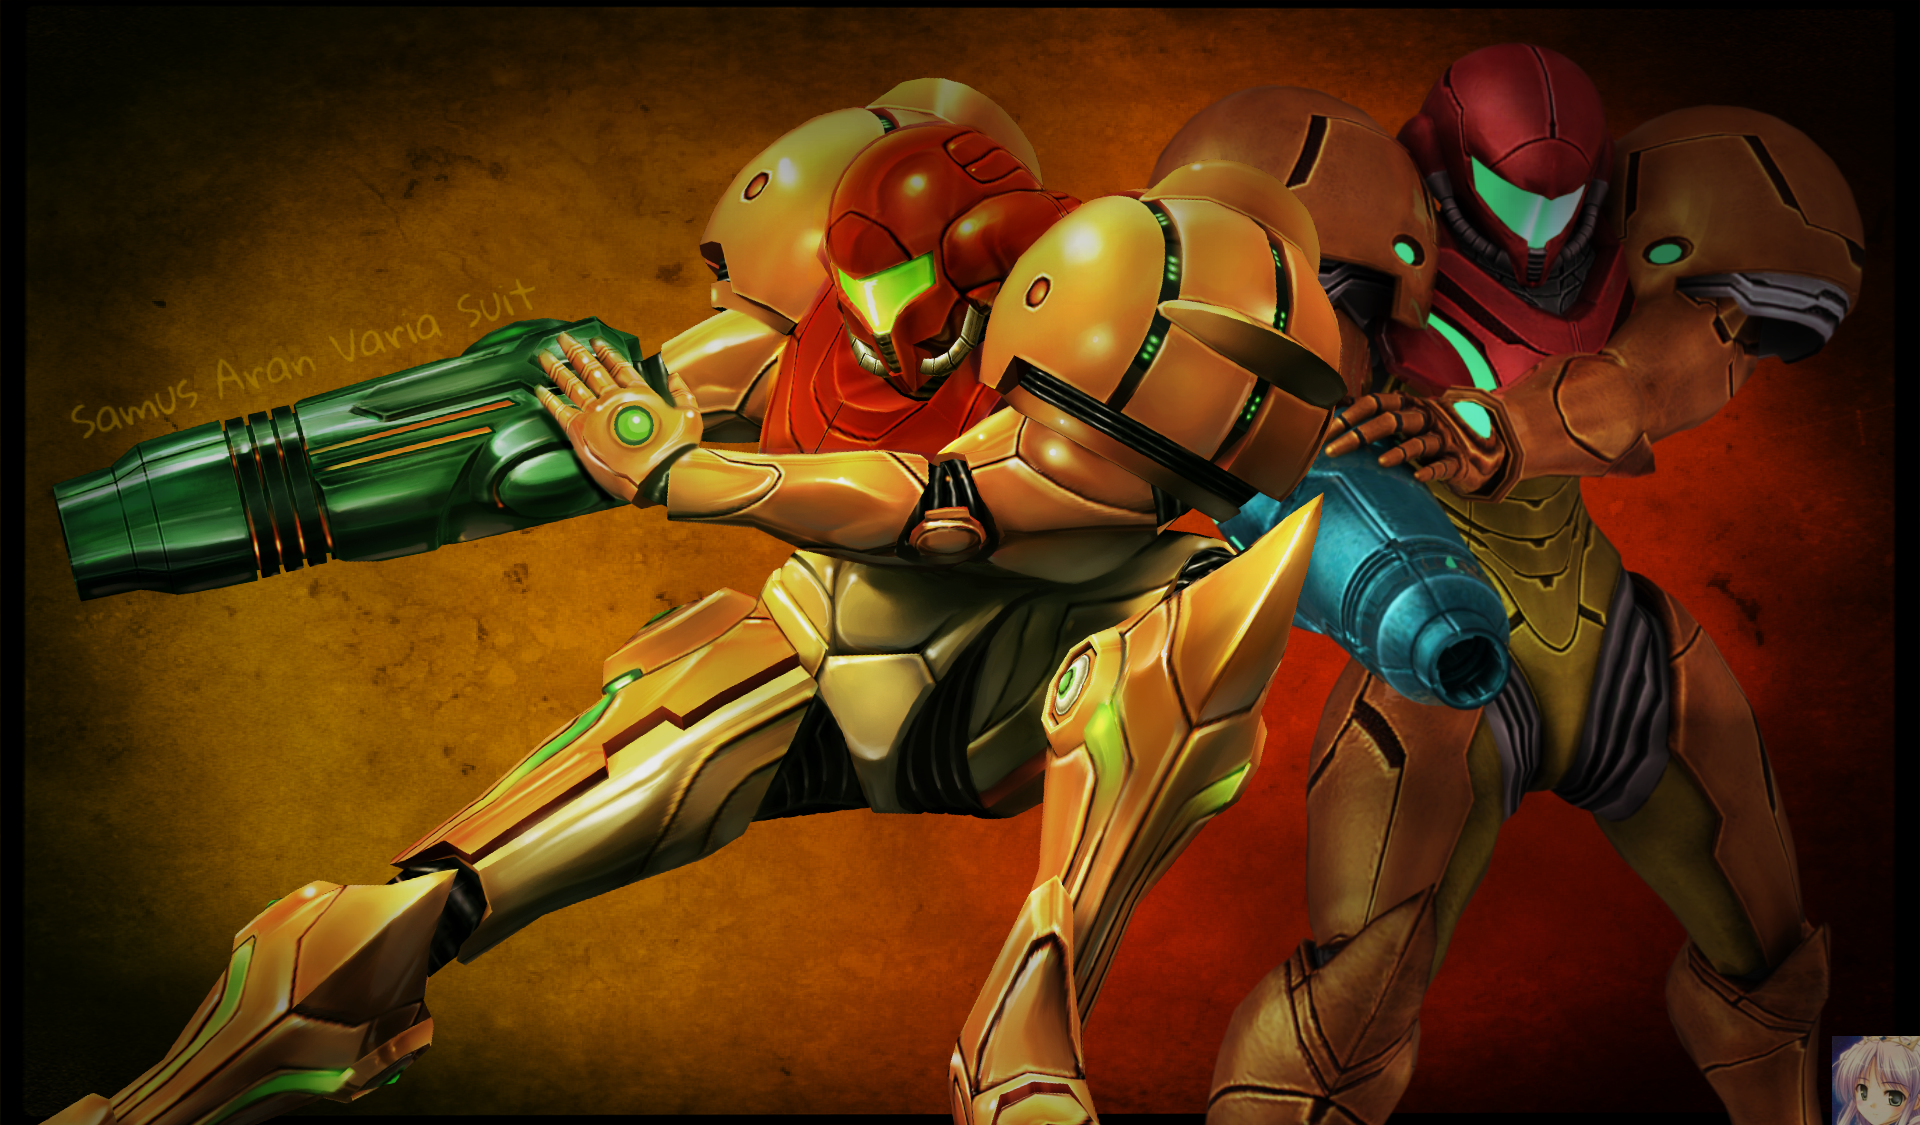 Metroid Samus Aran Varia Suit Wallpaper By Firefox4x On